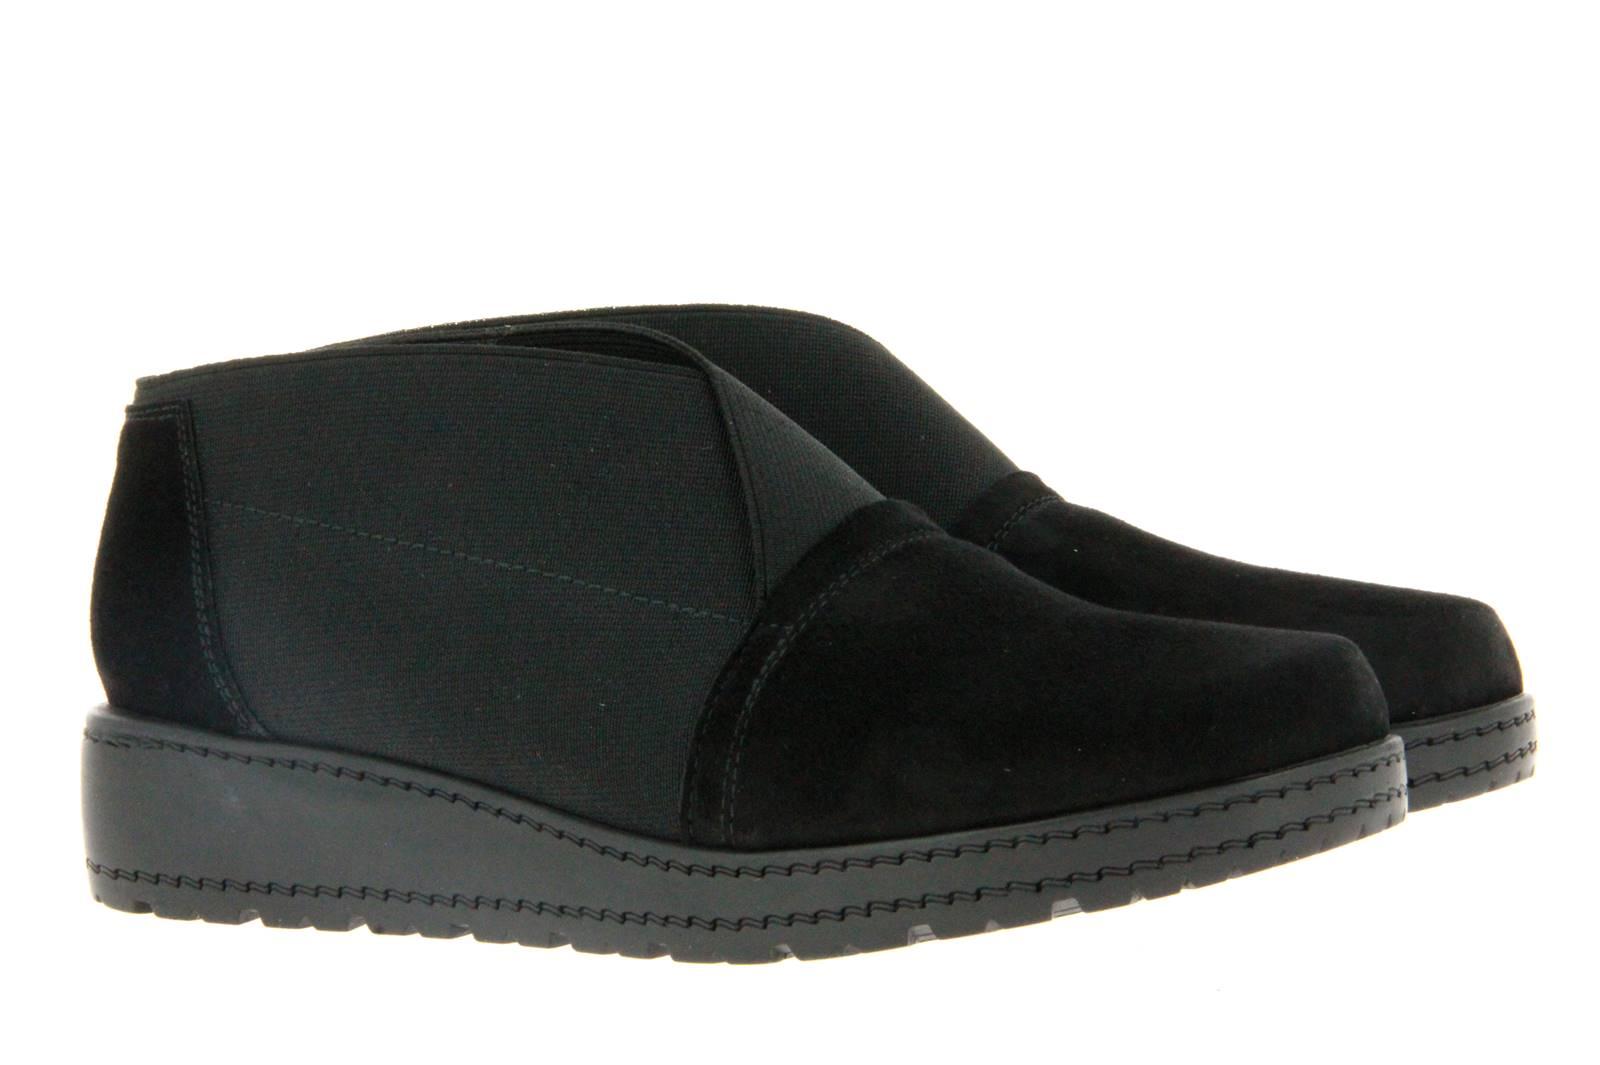 Stuart Weitzman ankle boots STRETCHDOWN BLACK